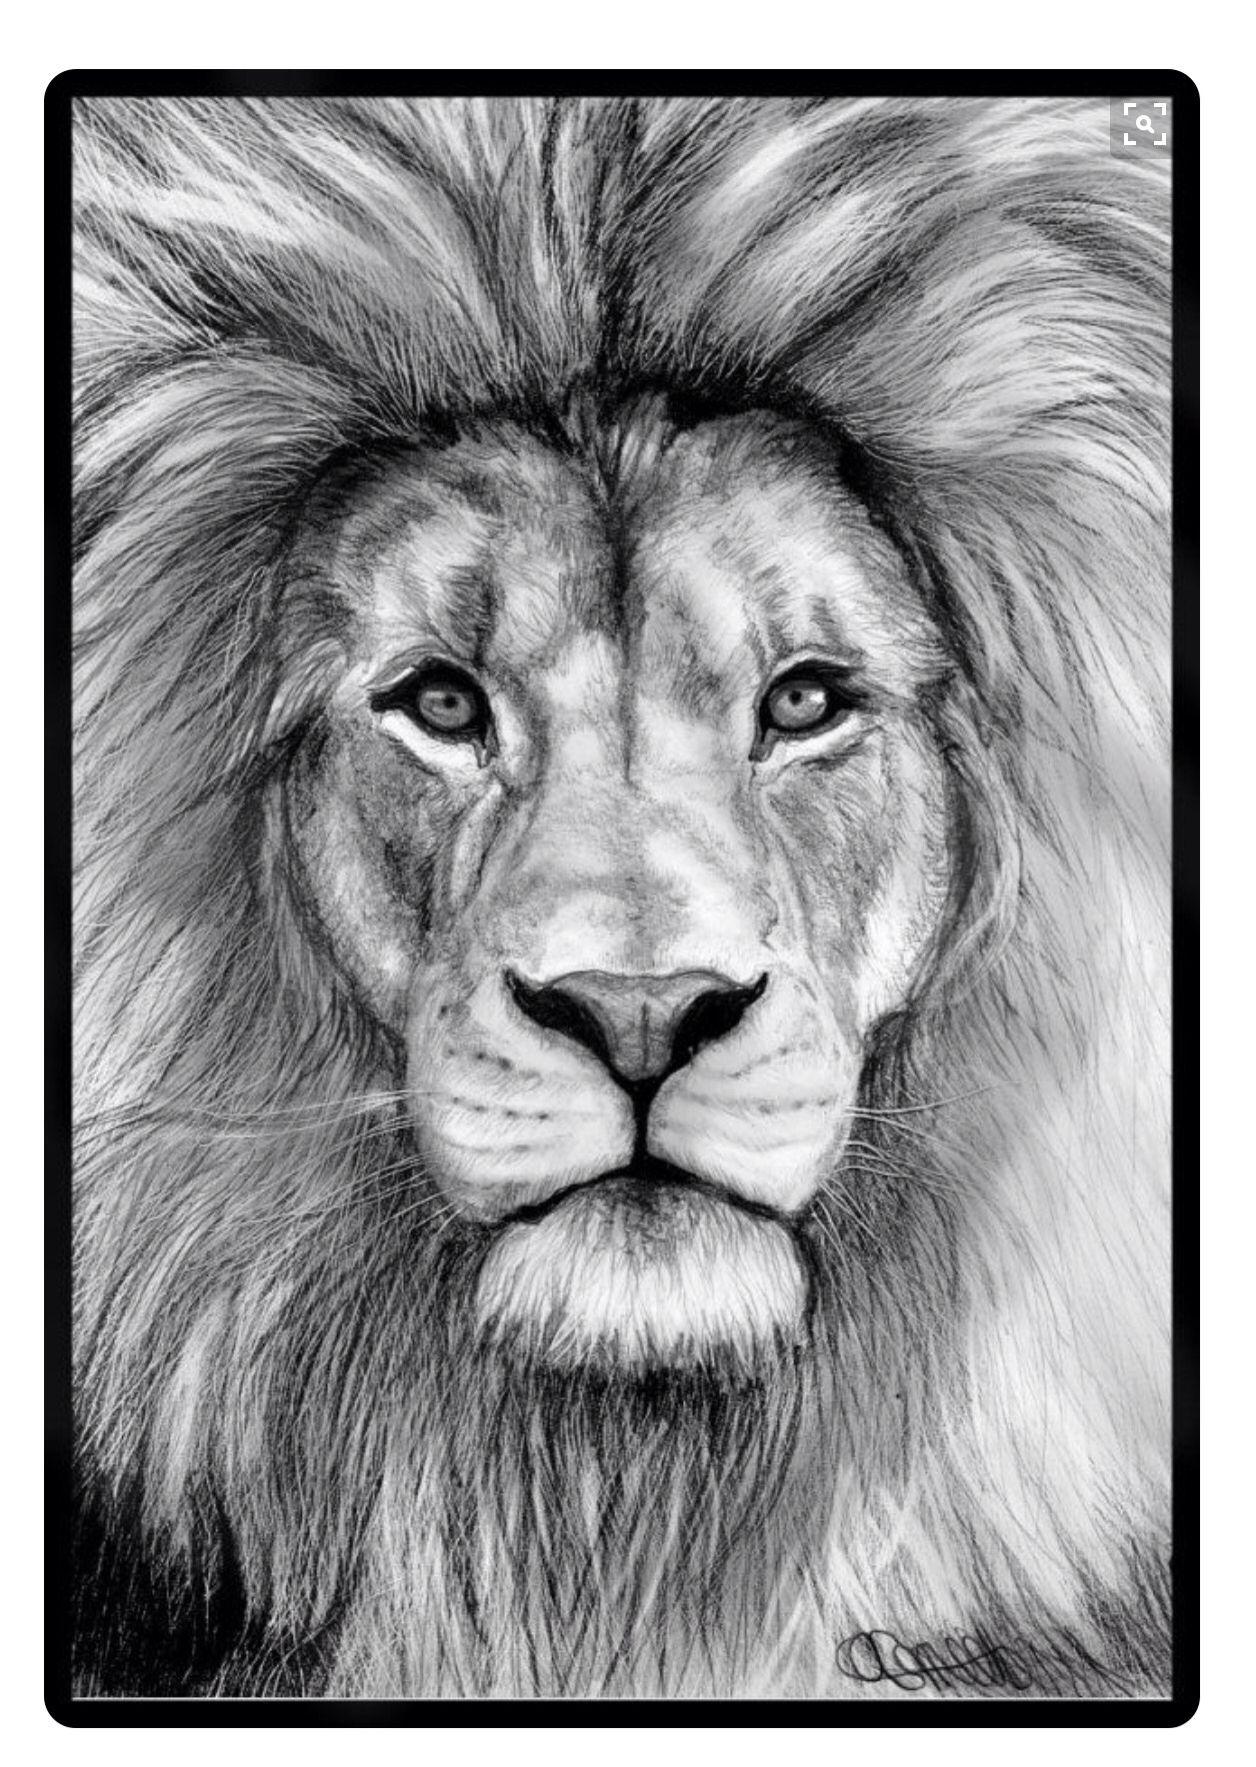 Pin De Joaquin Bordagorry En Jota Dibujos De Leones Animales